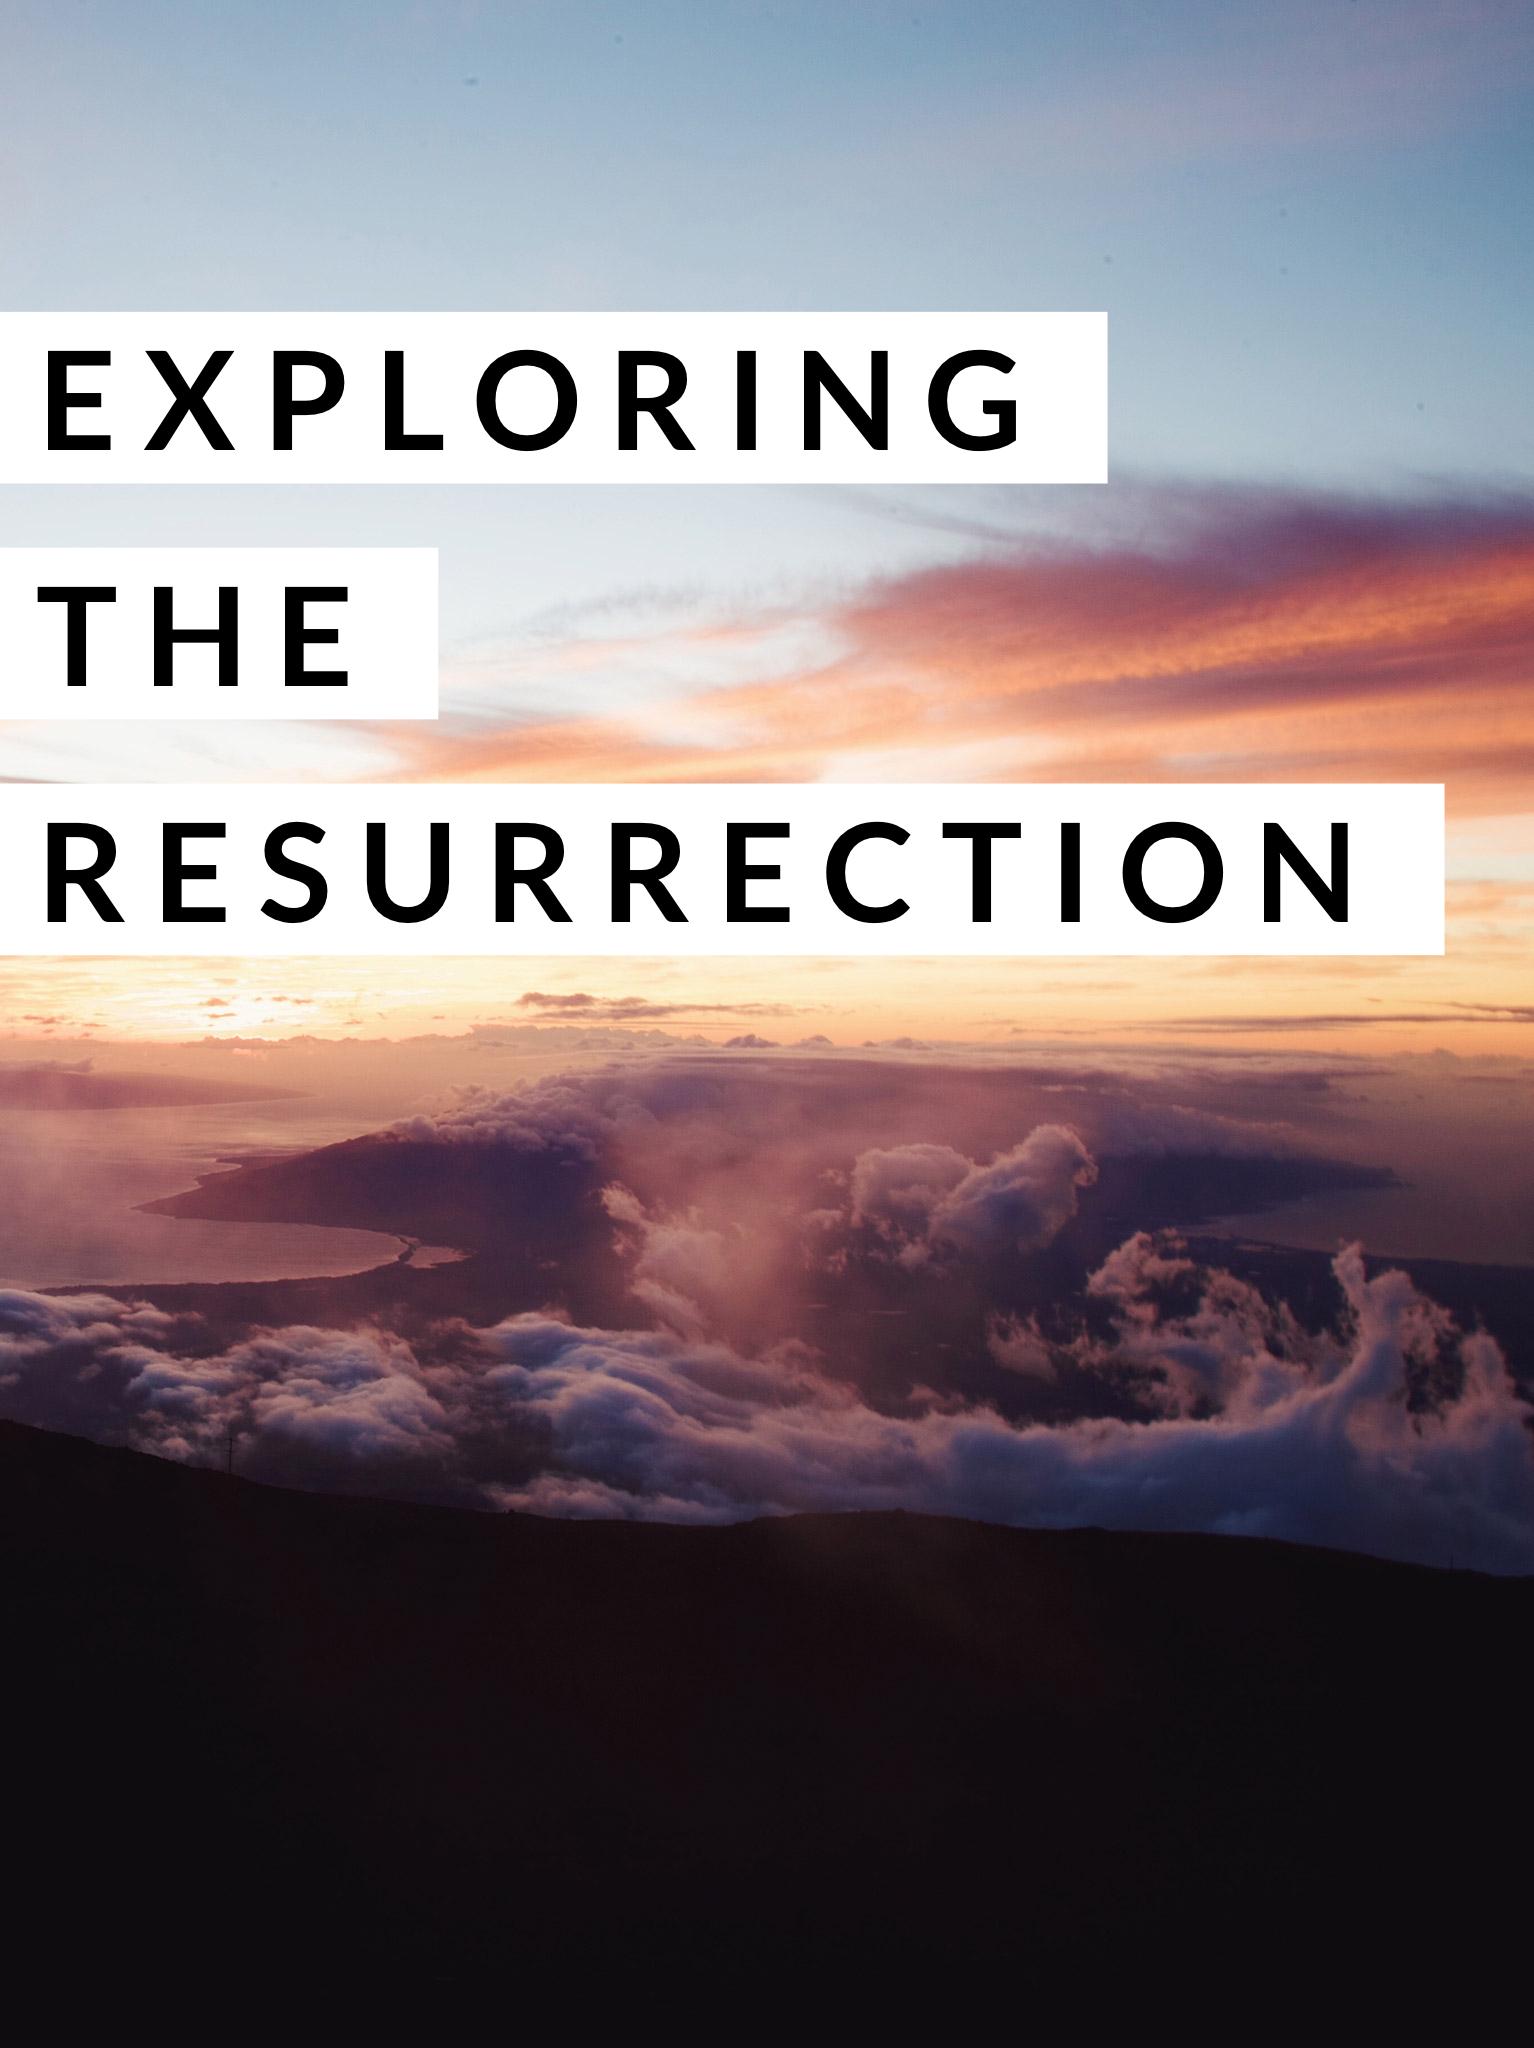 MercyHouse-RESURRECTION.JPG